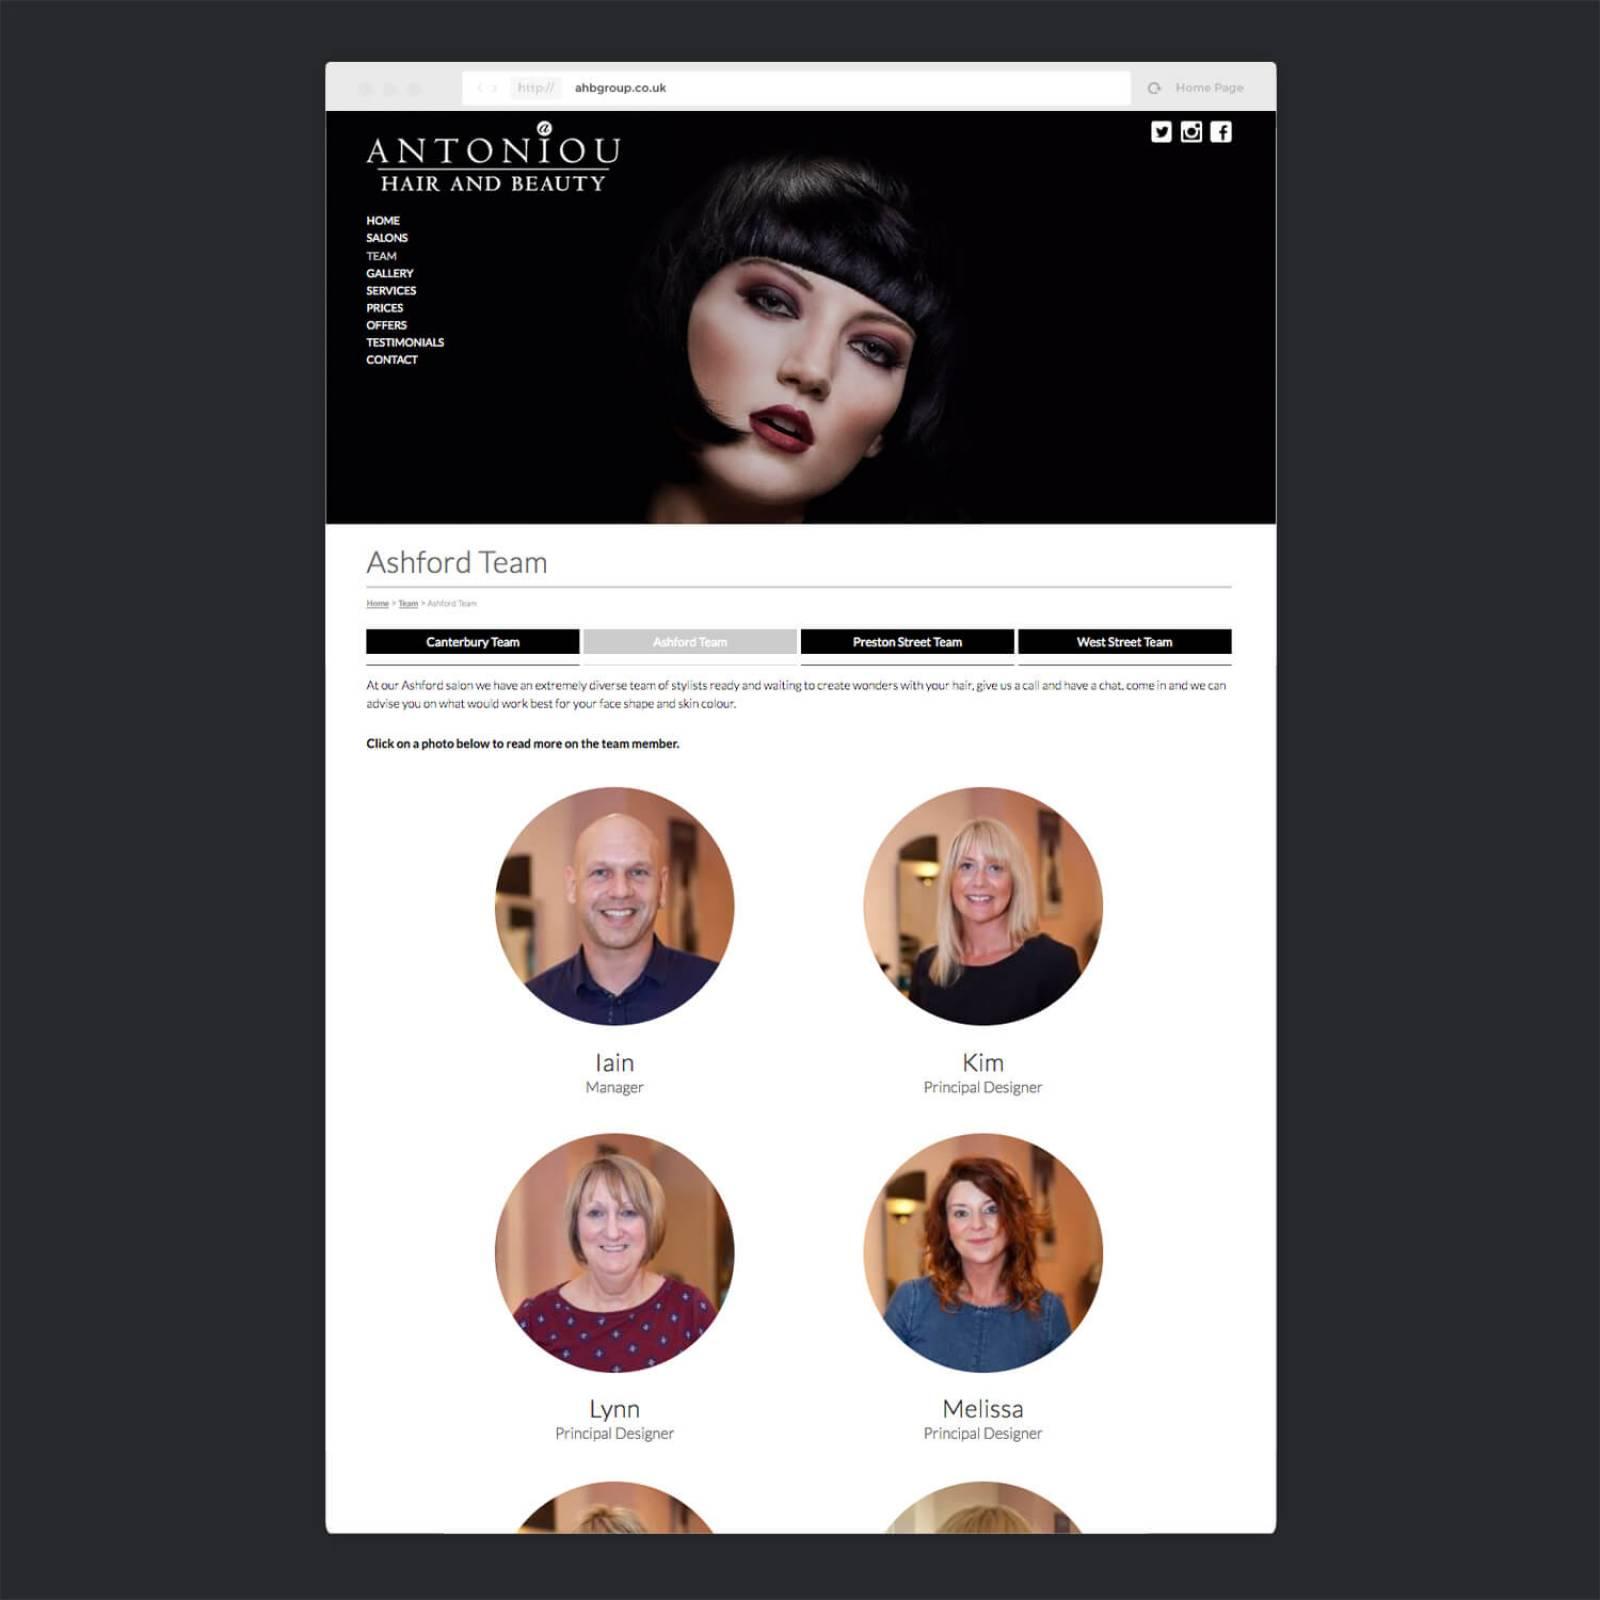 Antoniou-website-design-agency-graphic-design-canterbury-04.jpg